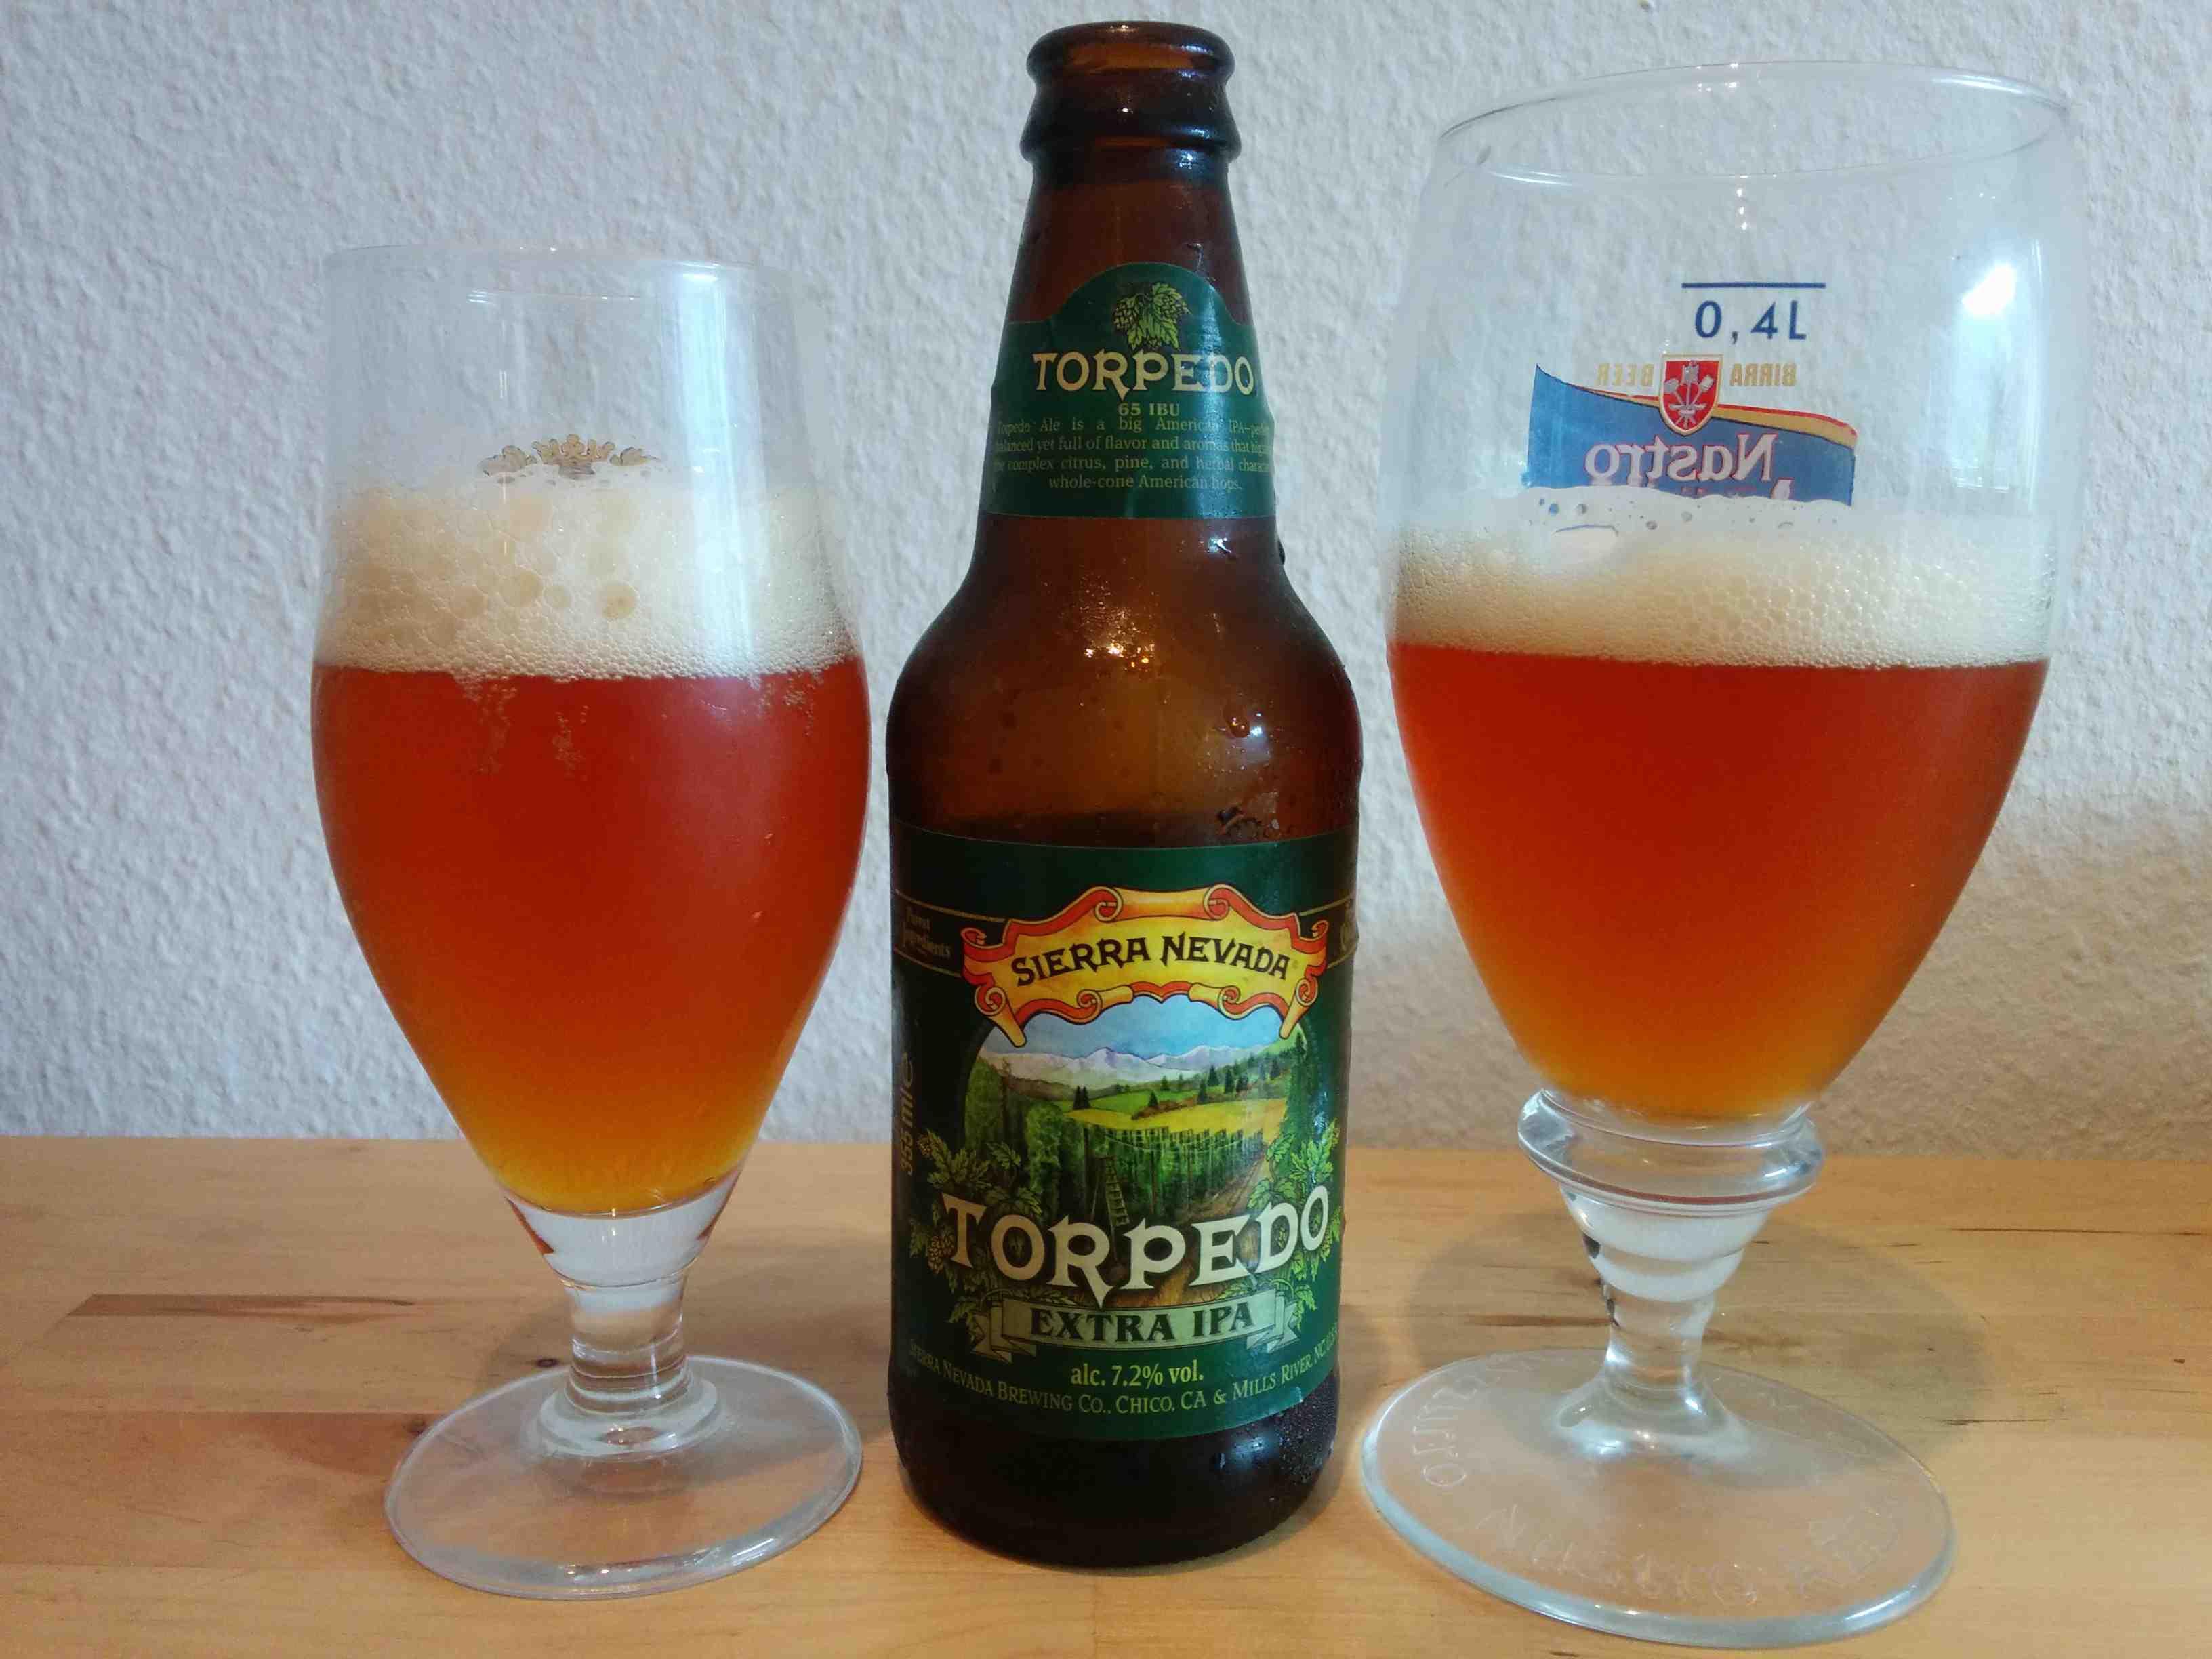 Sierra Nevada Torpedo extra IPA - I glas og flaske